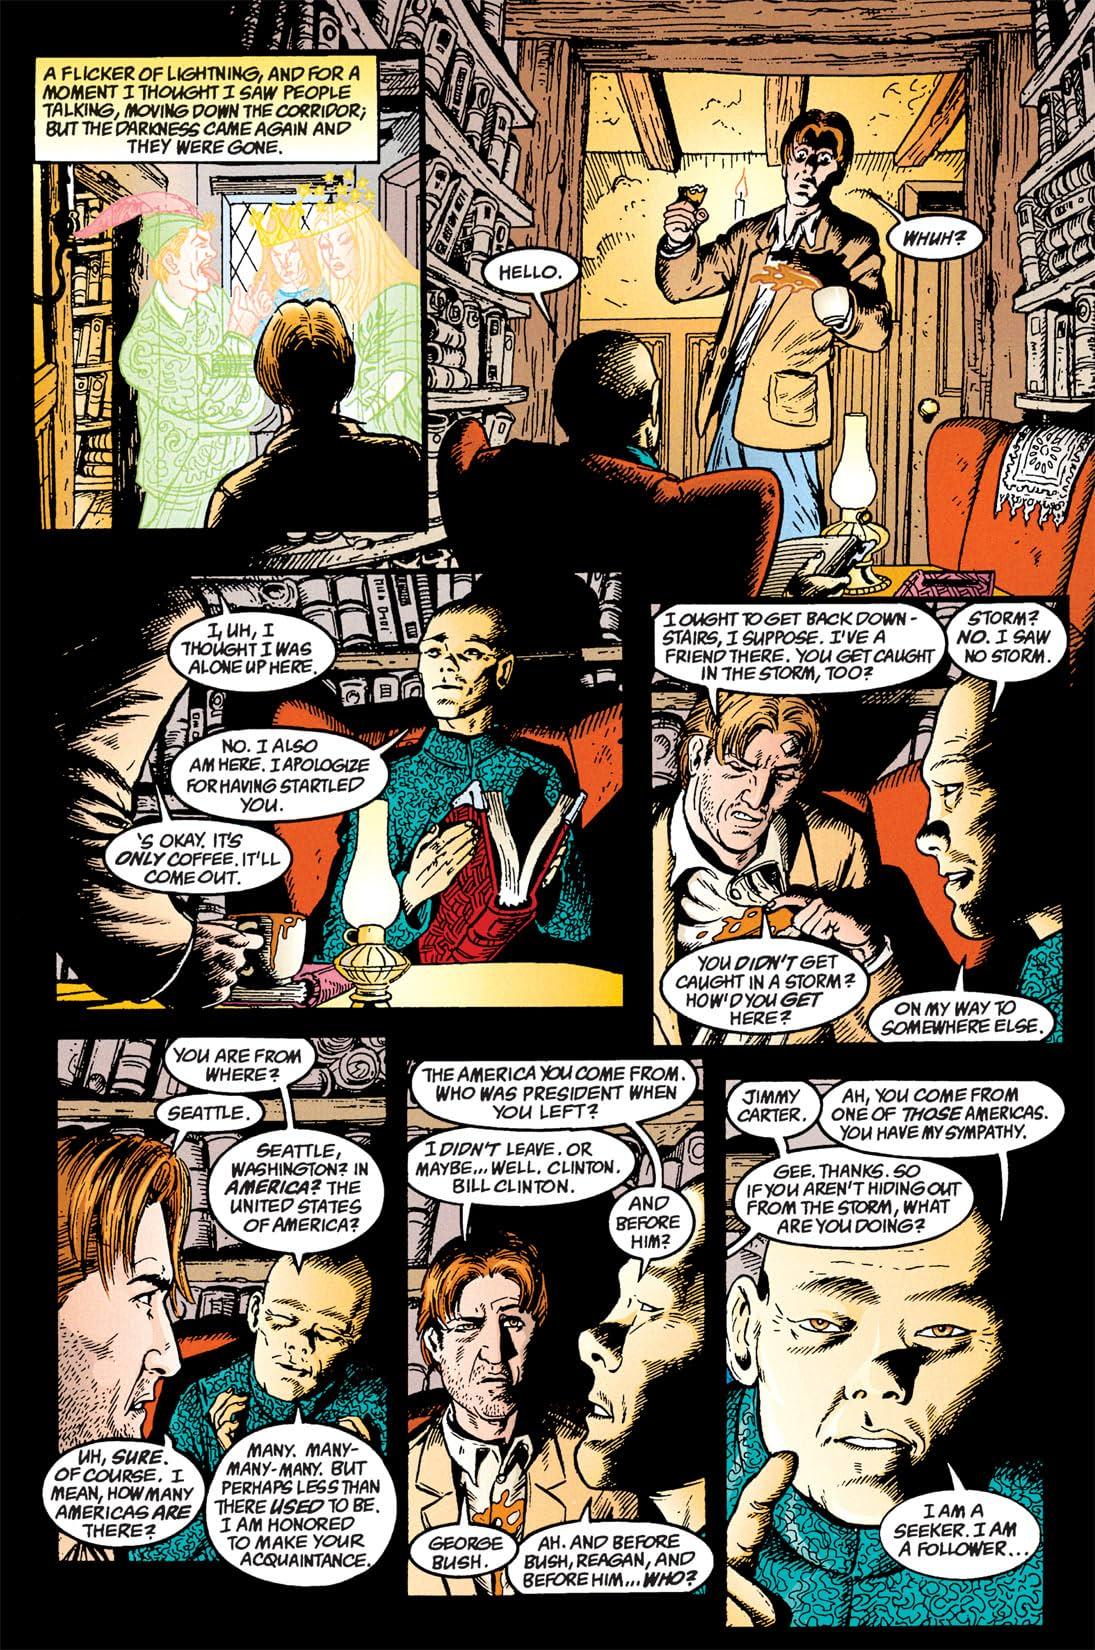 The Sandman #54